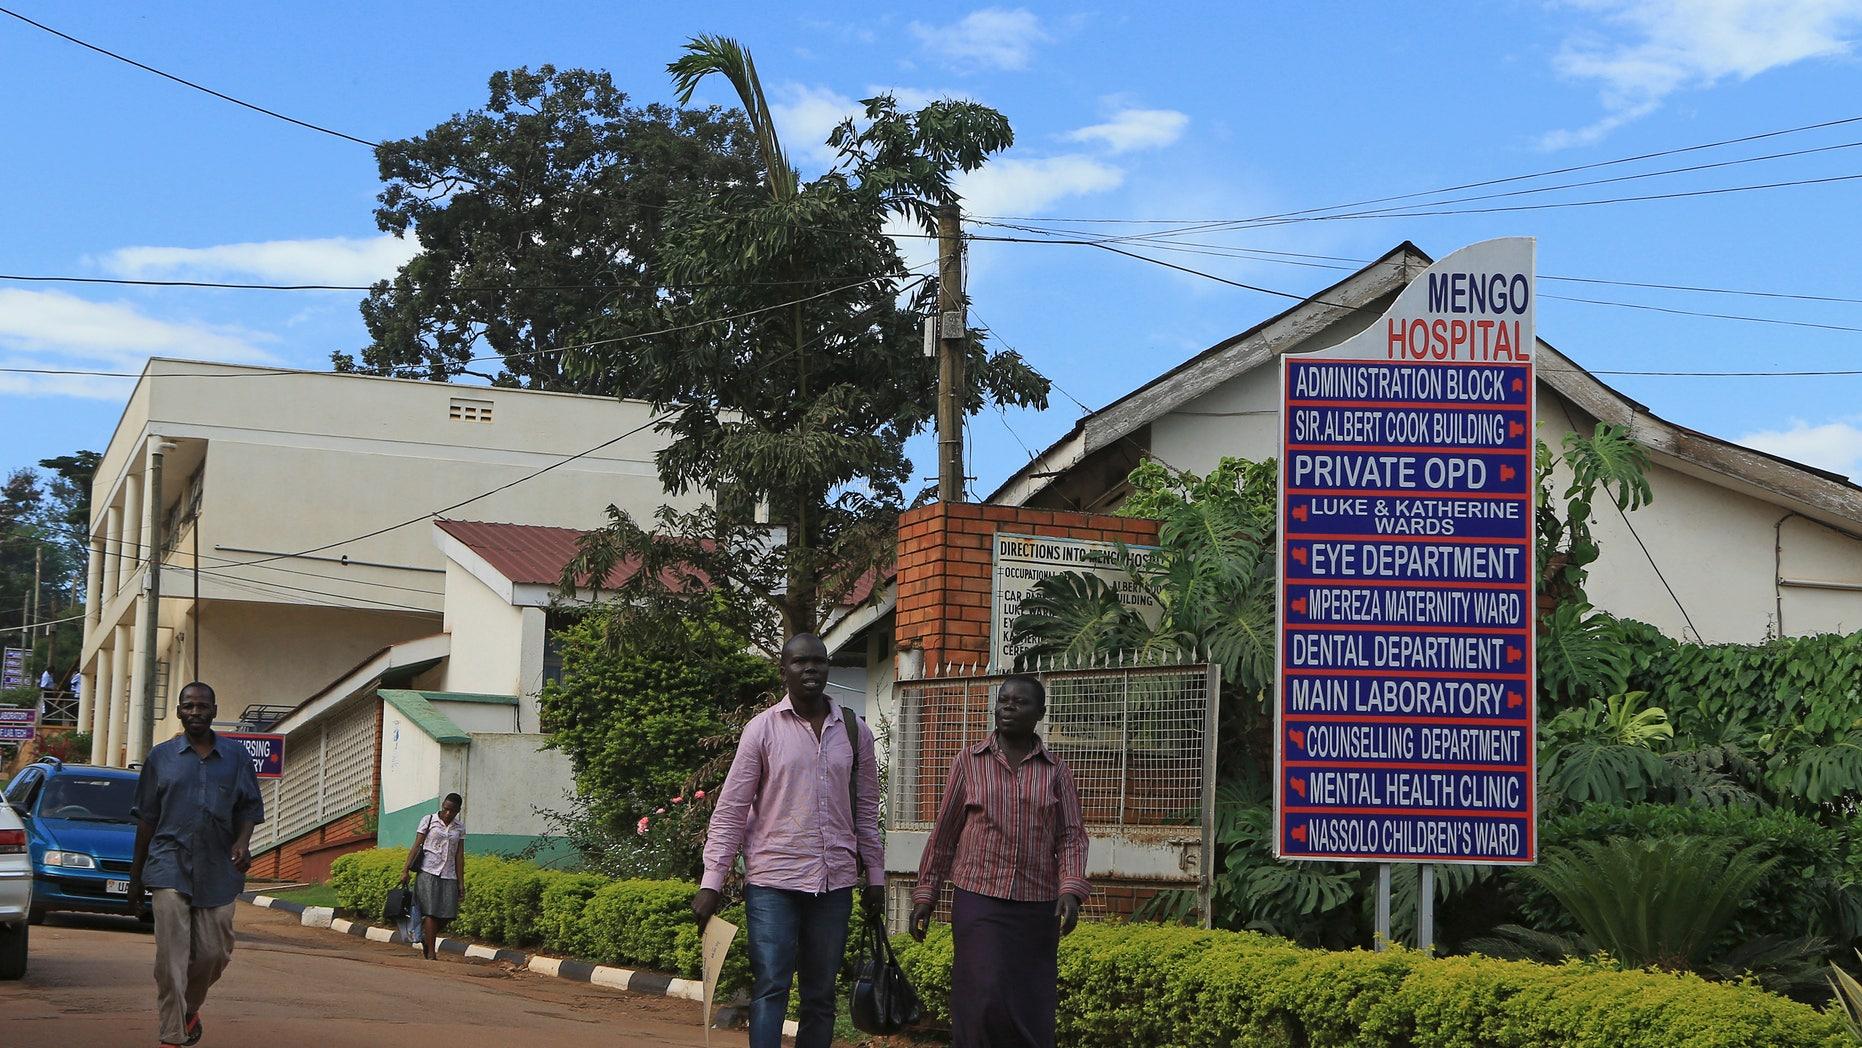 People walk in Mengo Hospital, where an employee died from the Ebola-like Marburg virus, in the Uganda capital Kampala October 6, 2014. REUTERS/James Akena